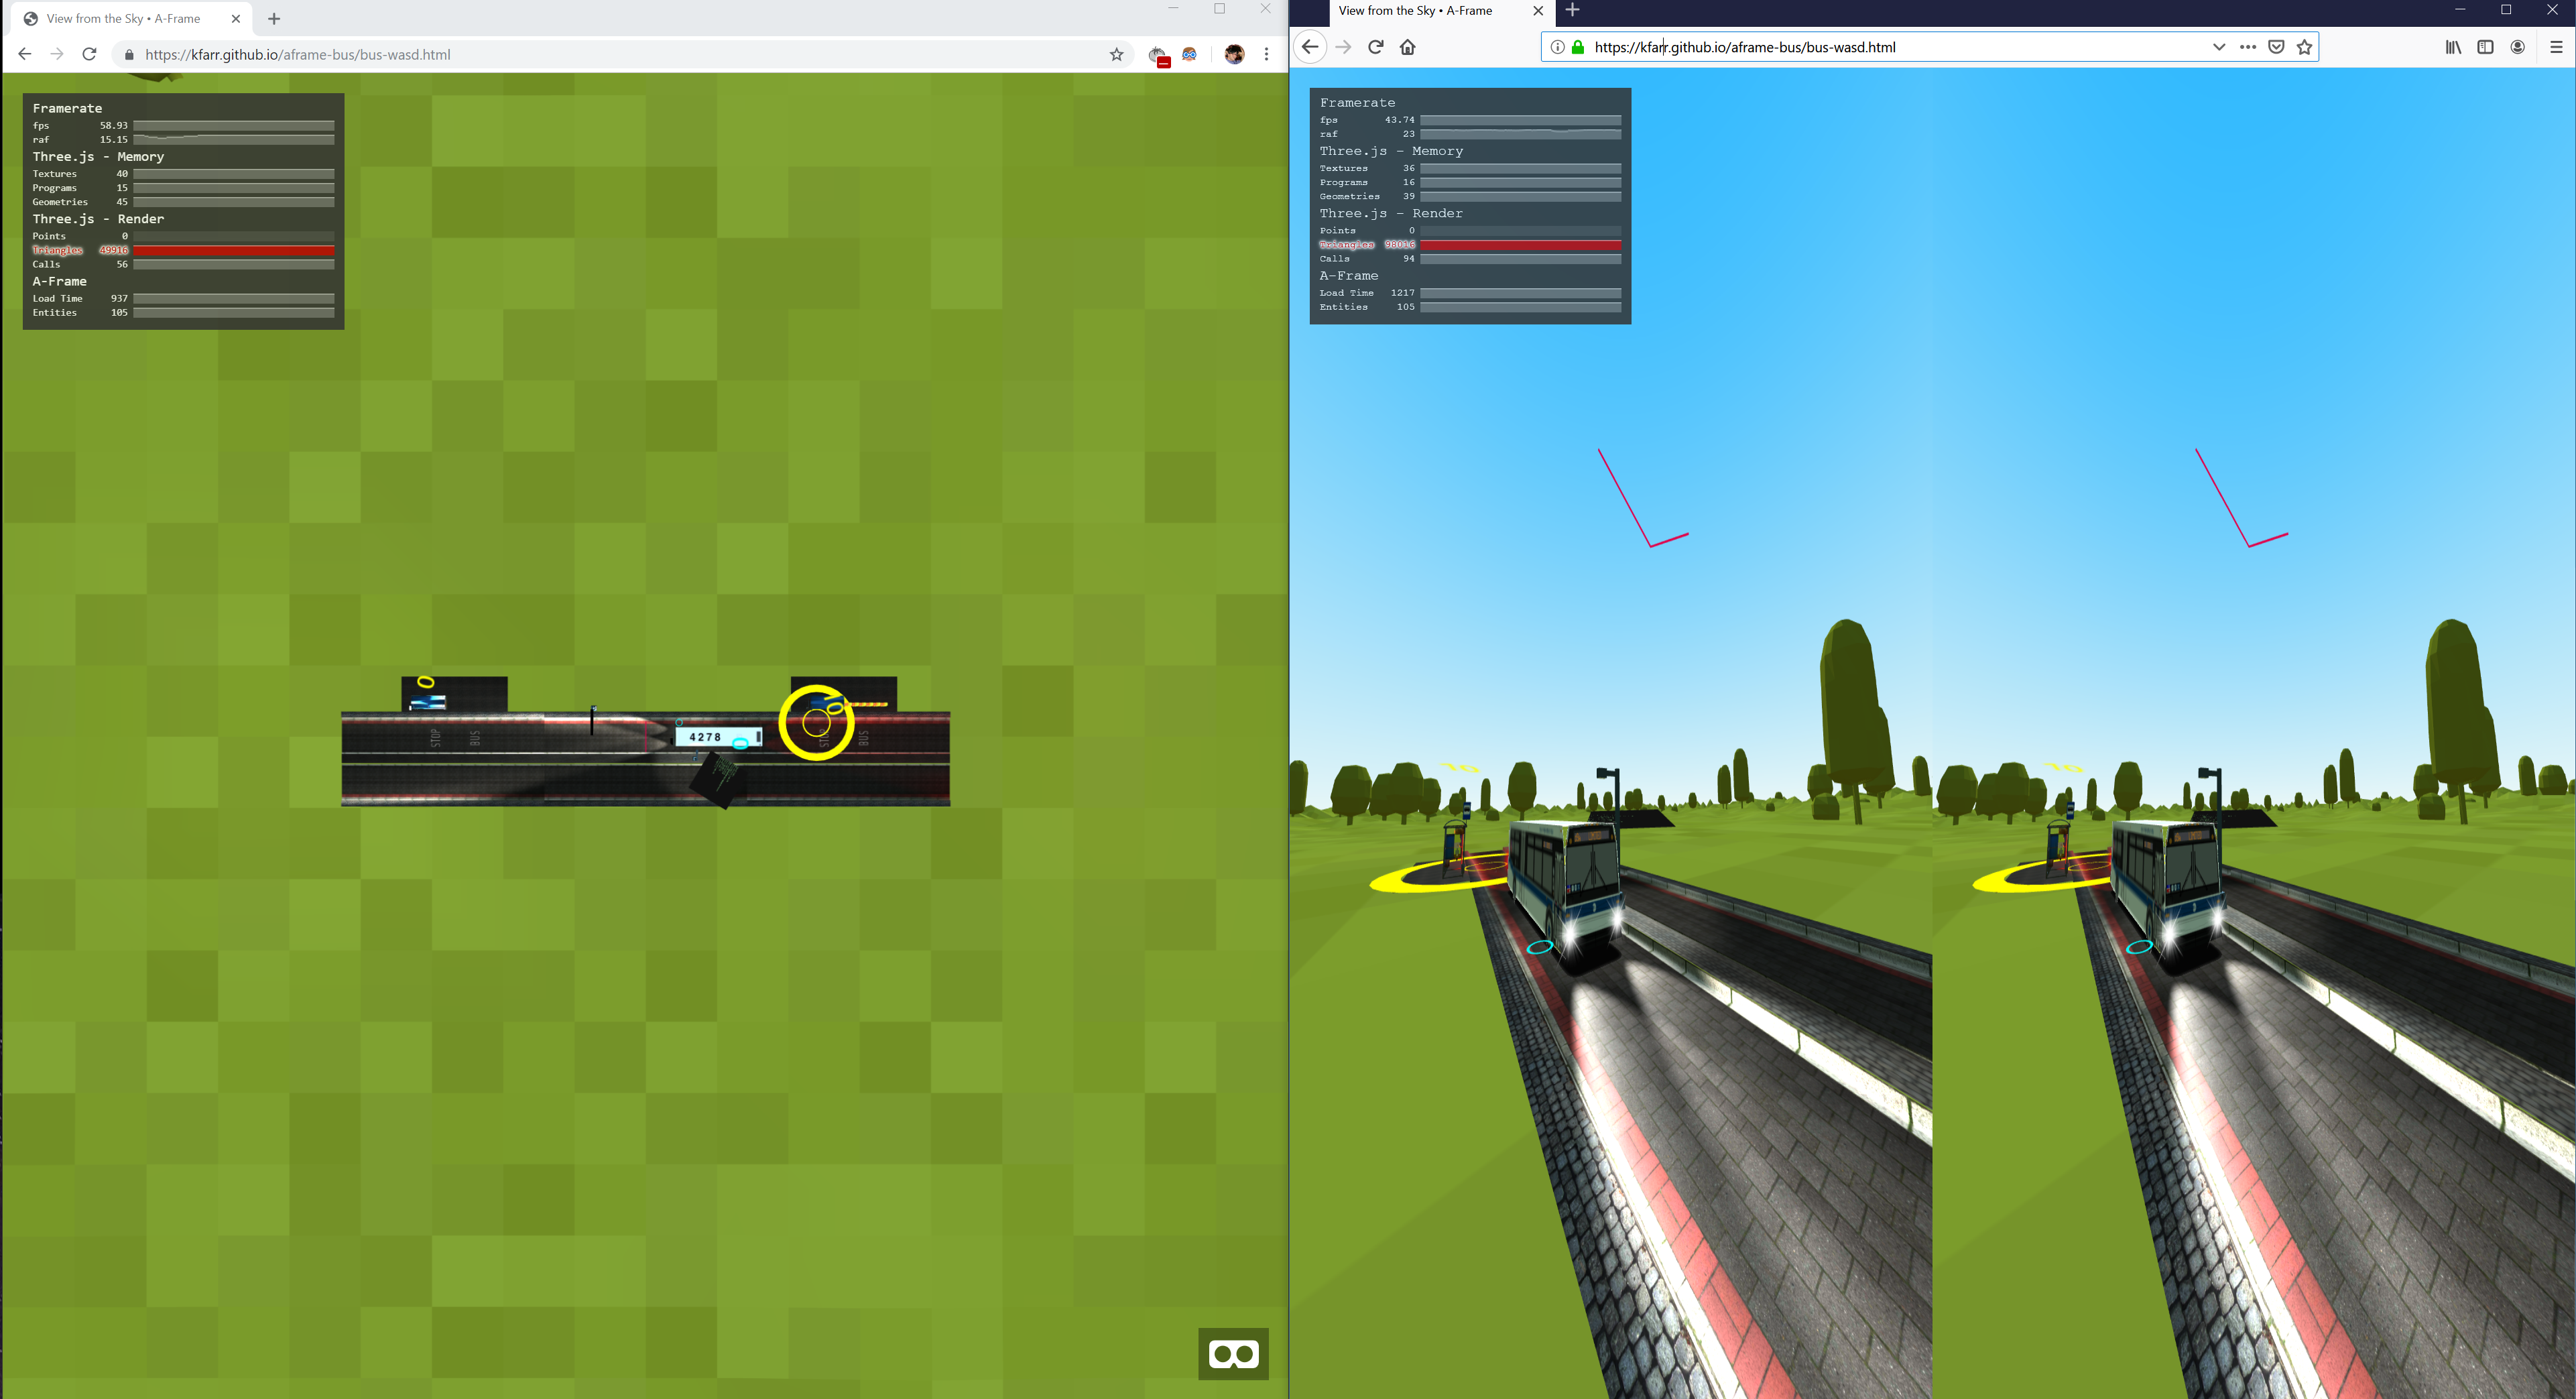 chrome-ff-Screenshot (44)